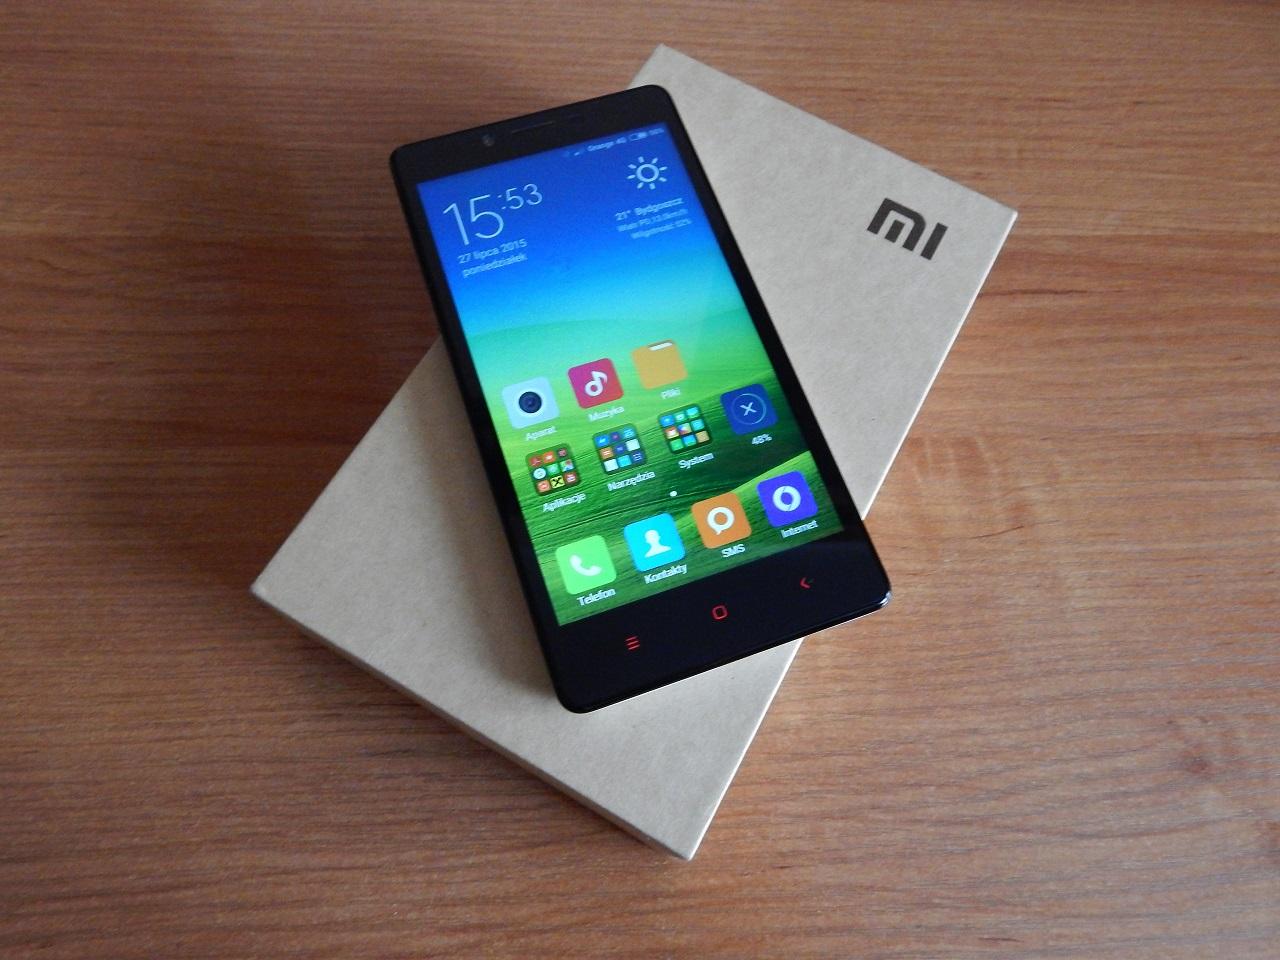 Jual Xiaomi Redmi 1s Chinh Hang Gia Re Tablet 8gb Hitam Rozpoczynamy Testy Note Co Chcecie